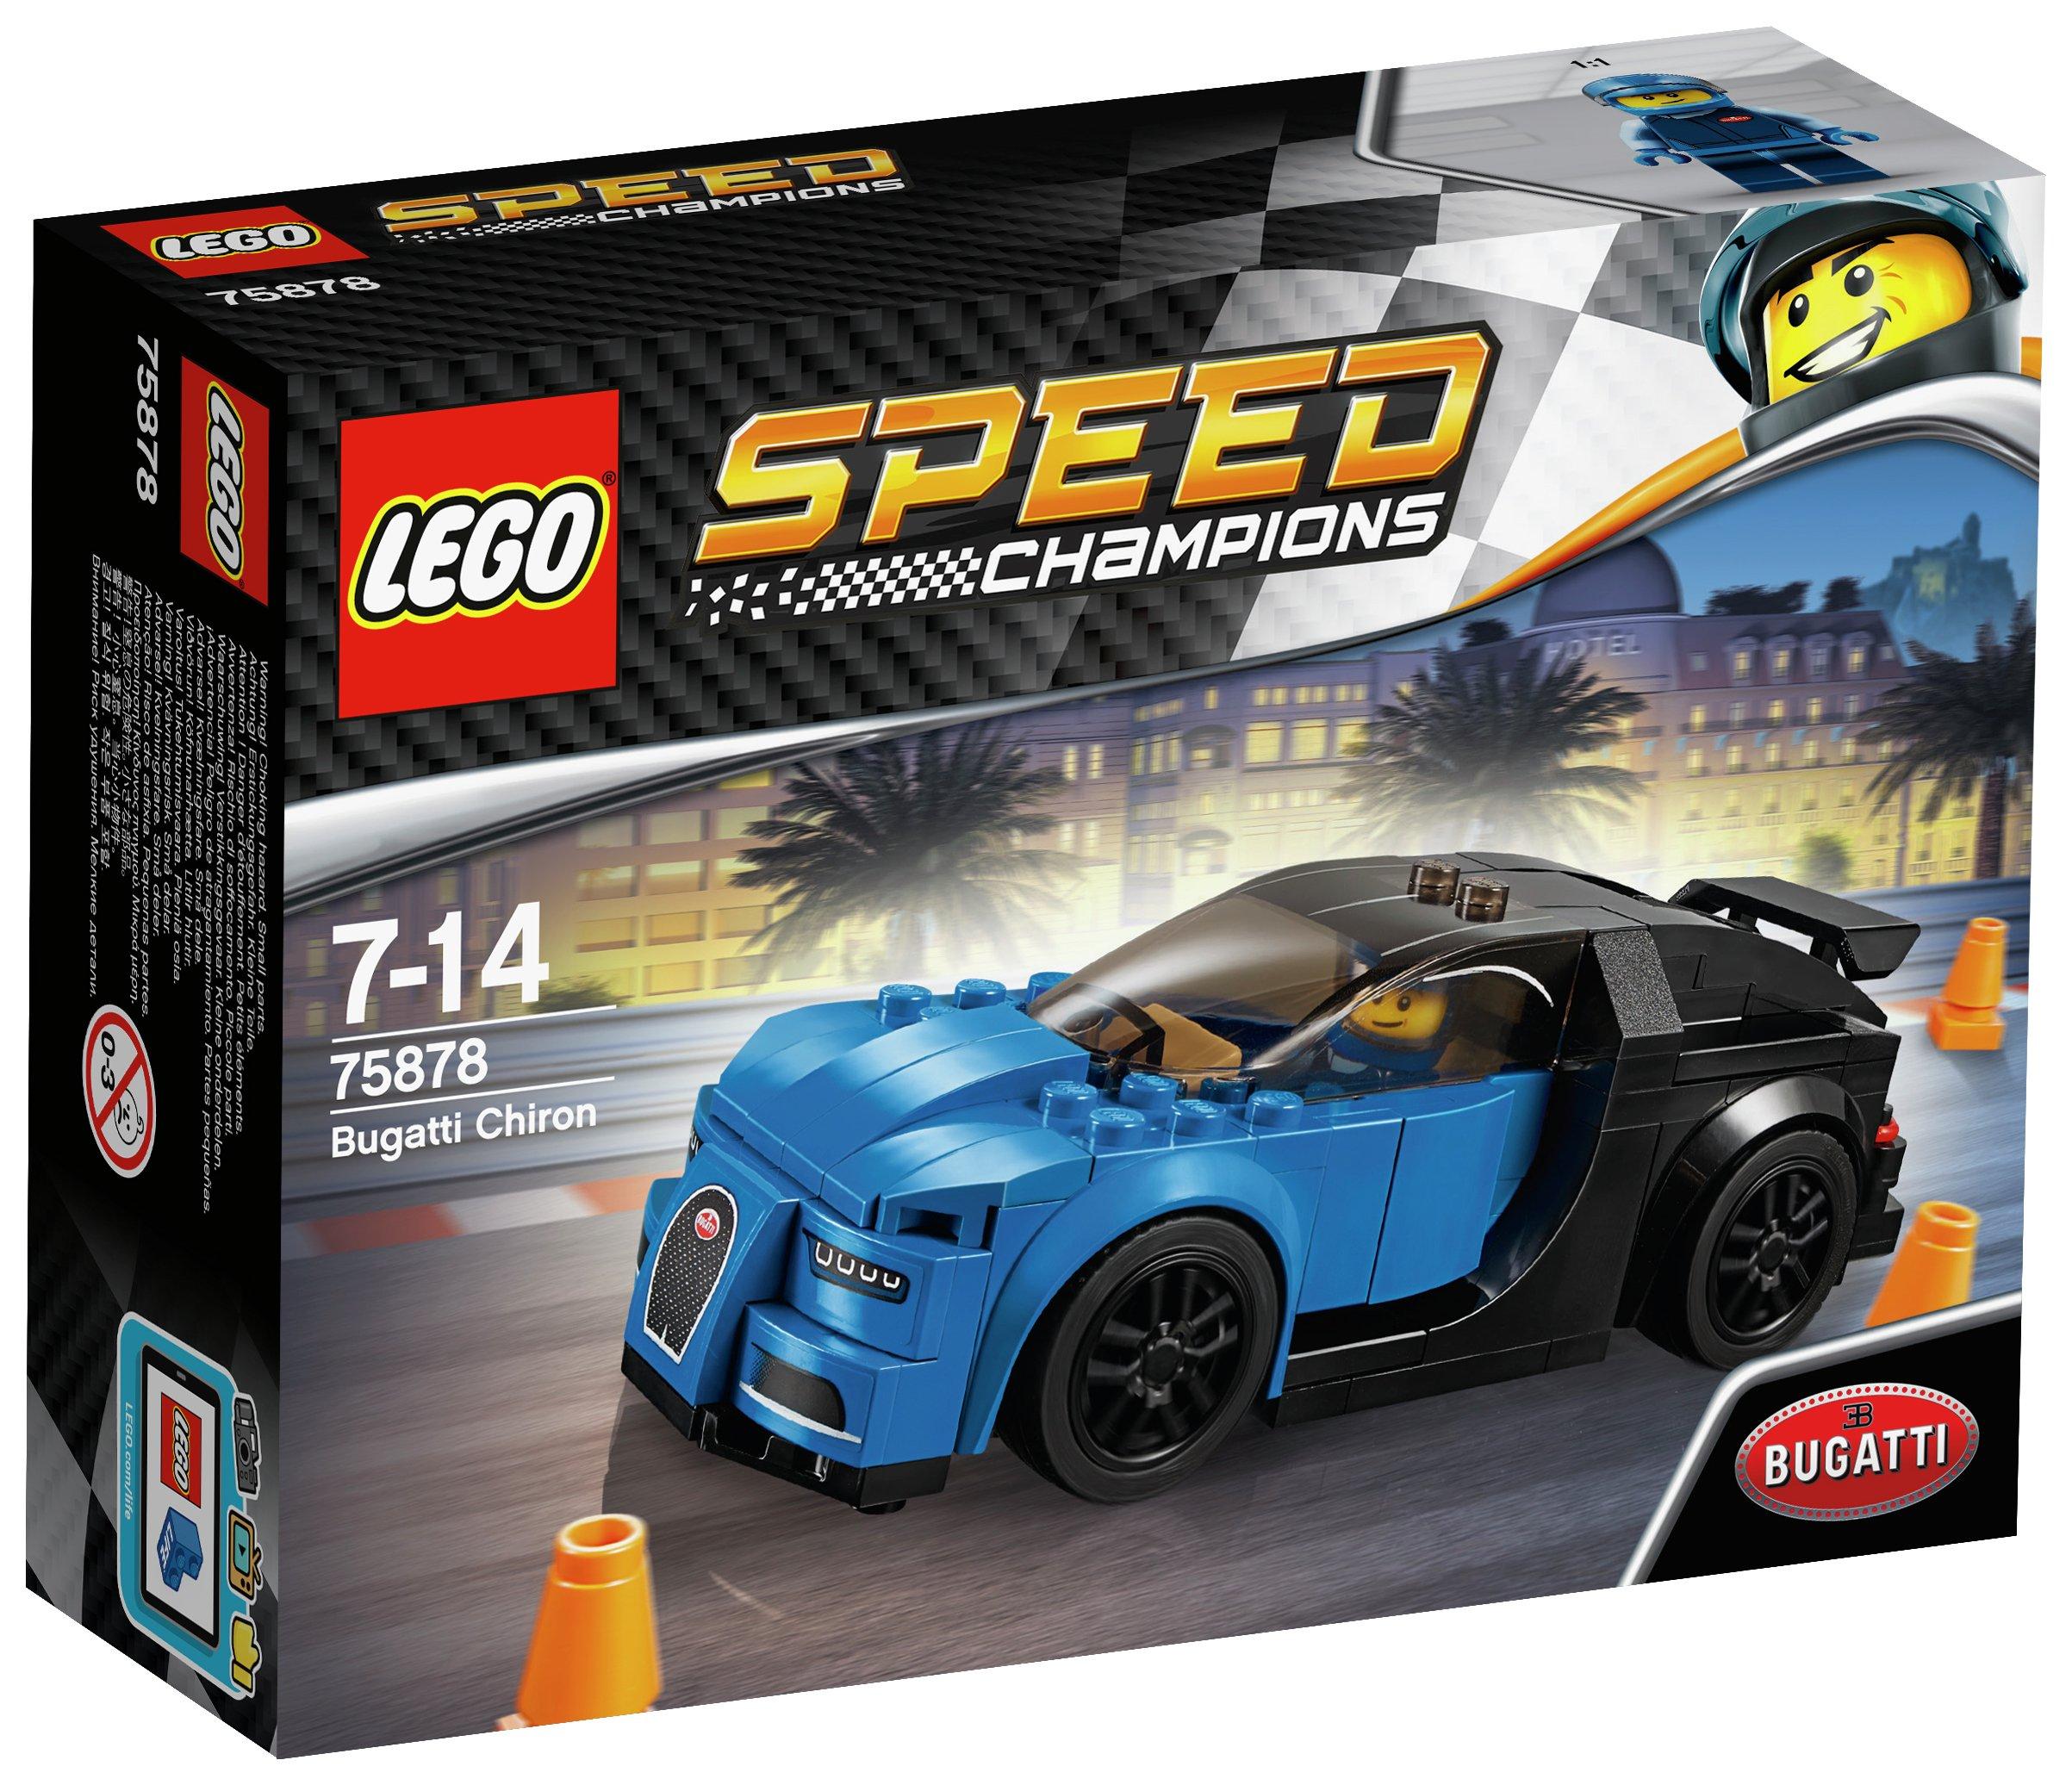 LEGO Speedchamps Bugatti Chiron - 75878.